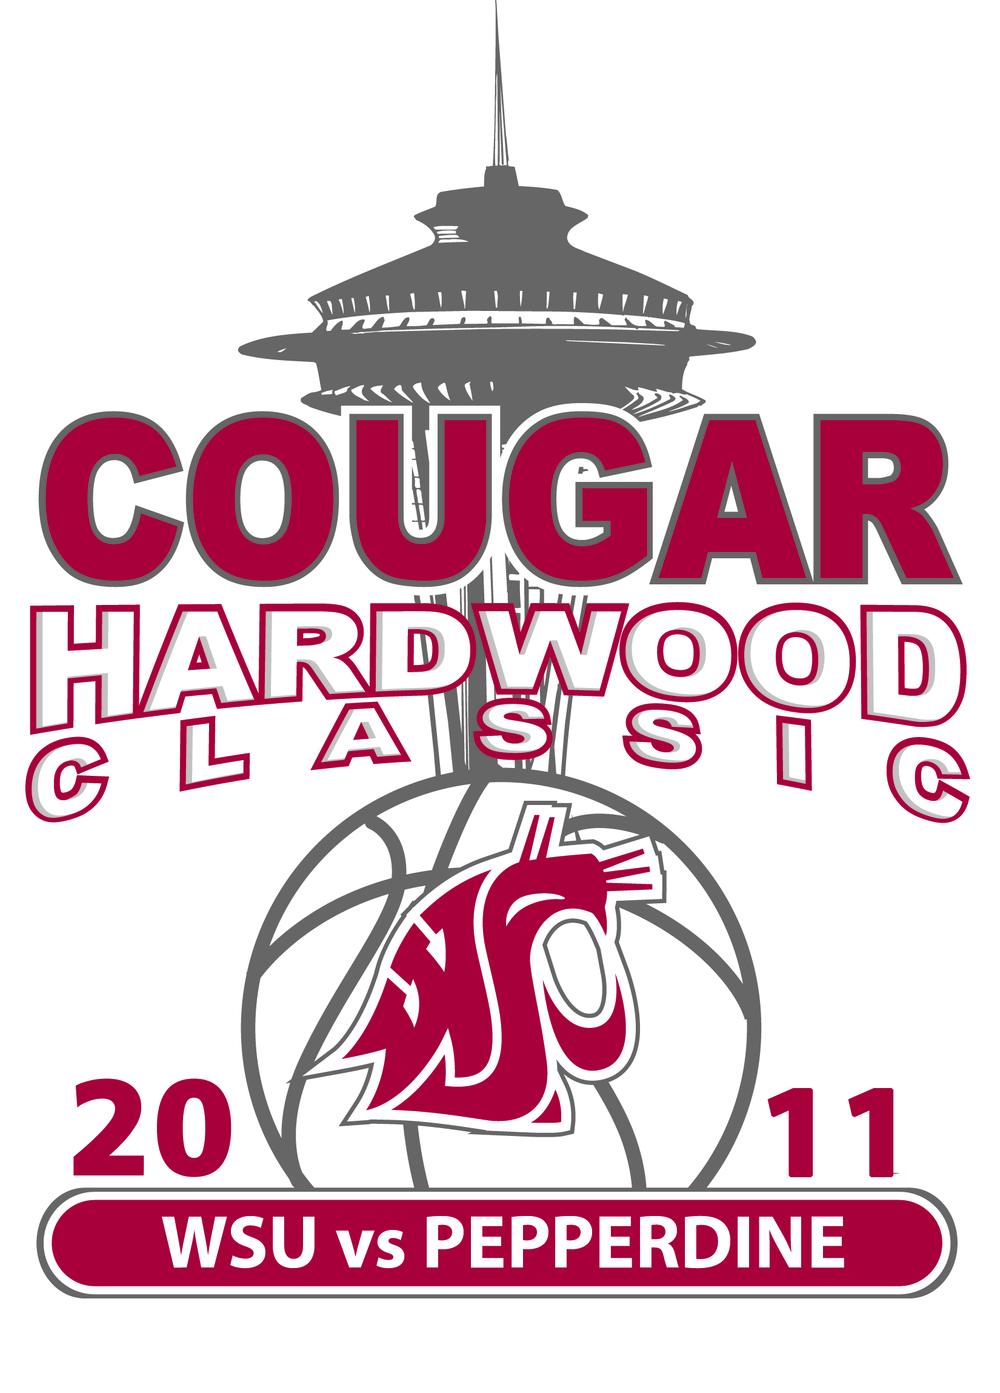 2011 Cougar Hardwood Classic.jpg